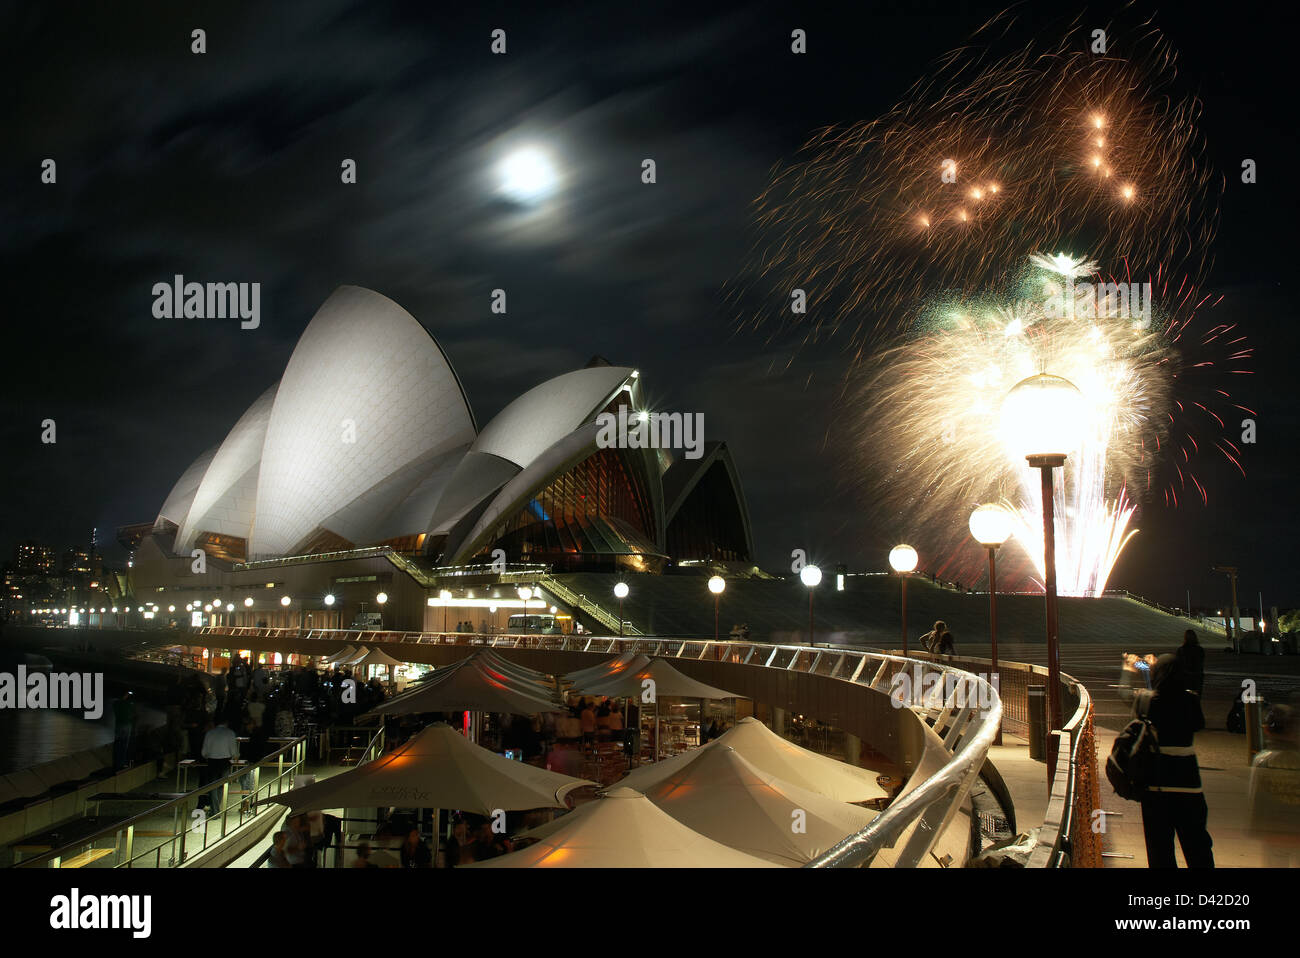 Sydney, Australia, fireworks over the Opera House on Bennelong Point - Stock Image